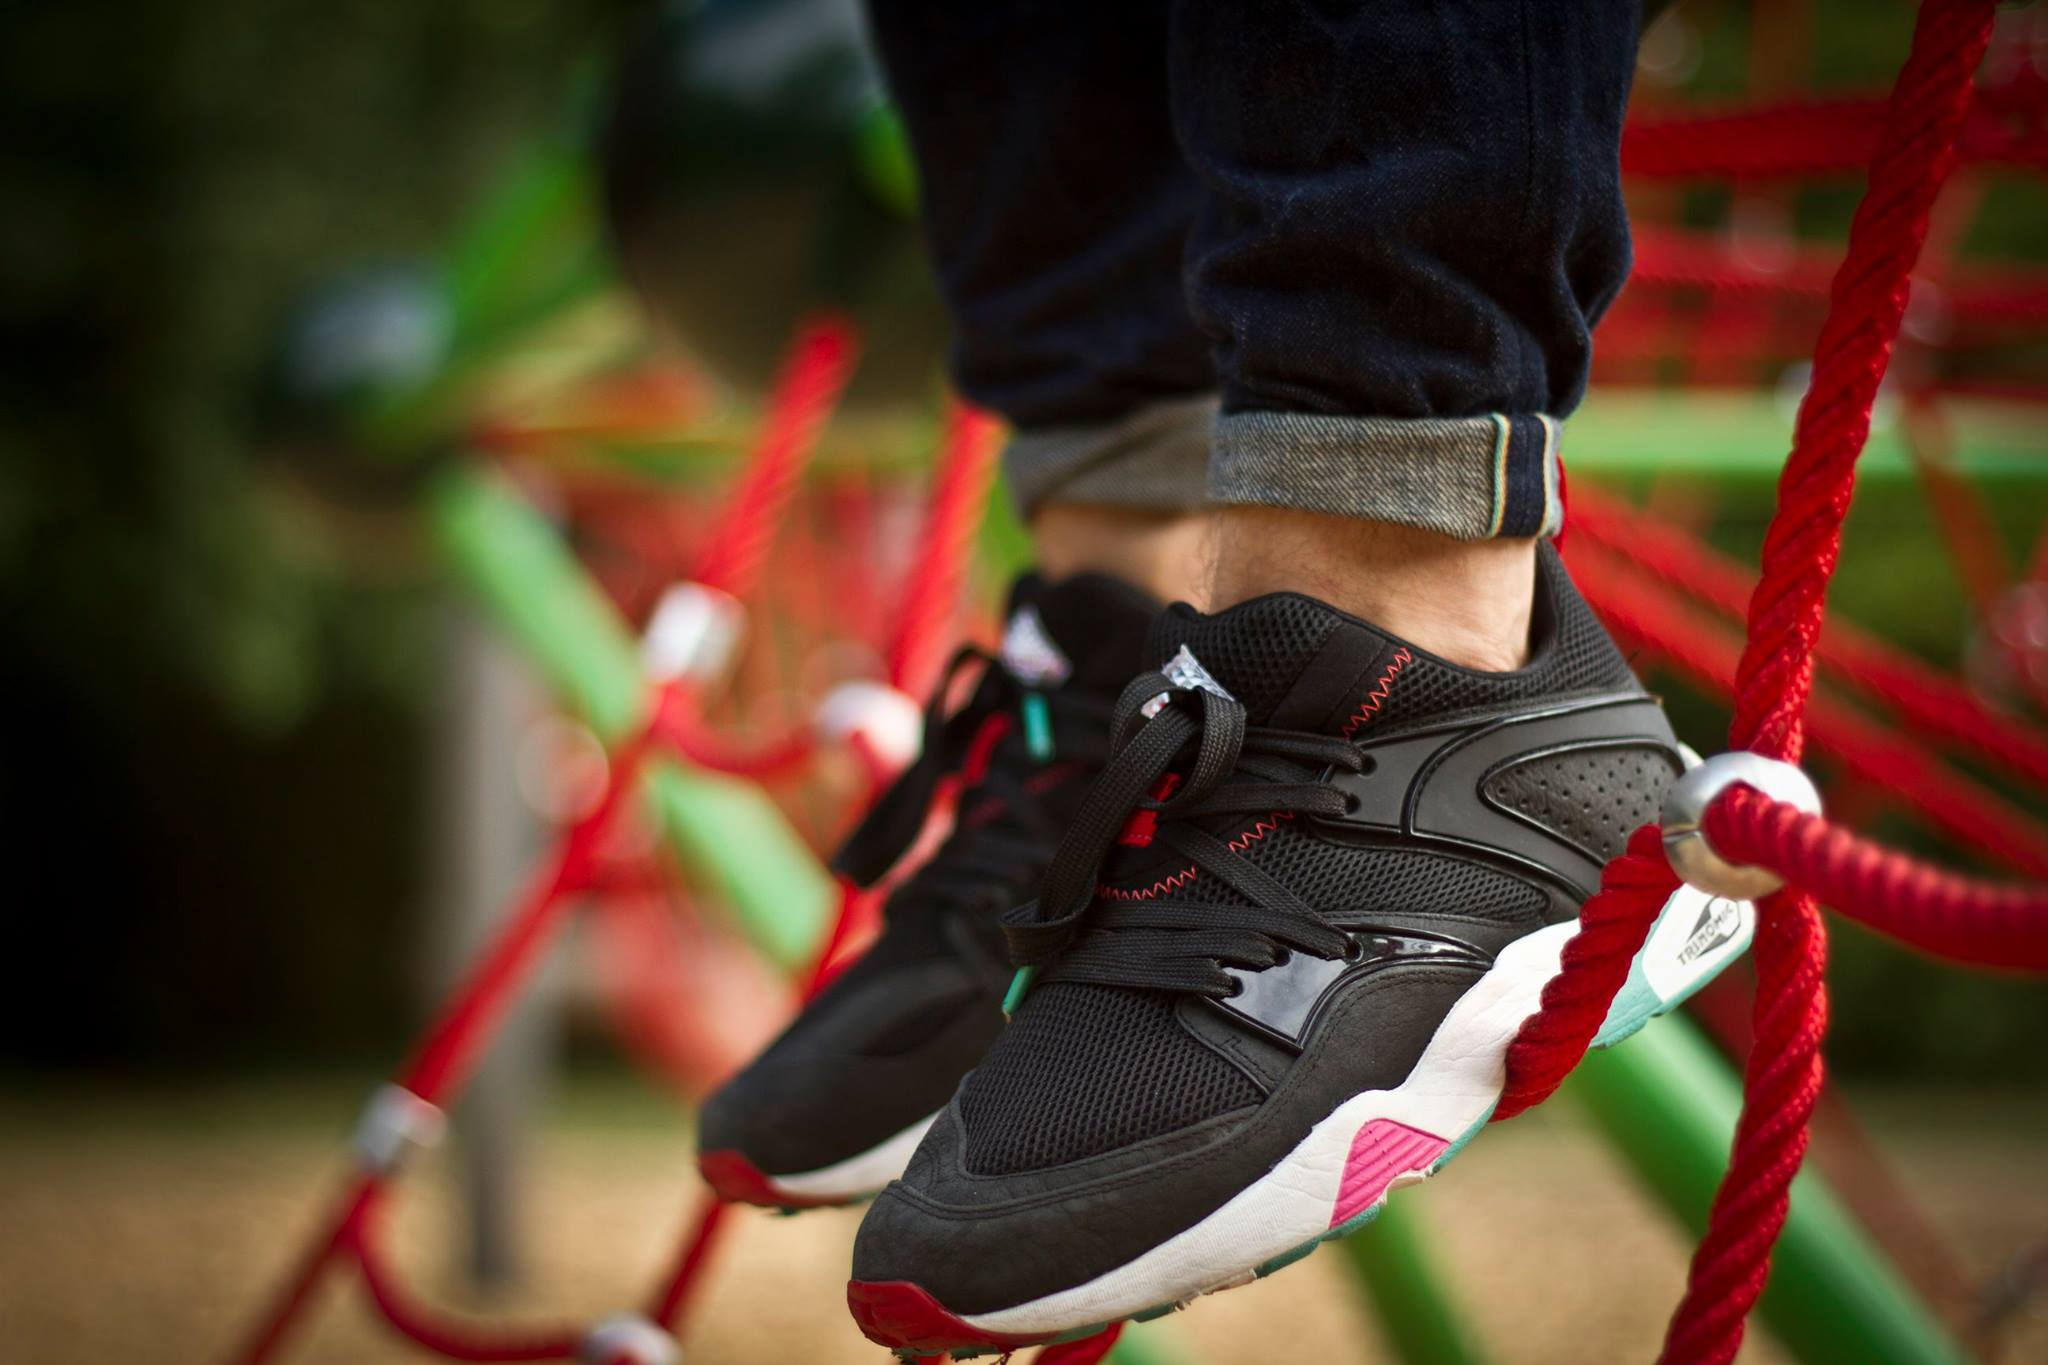 Stephan Kranke -   Sneakerfreaker x Puma Blaze of Glory 'Black Beast'